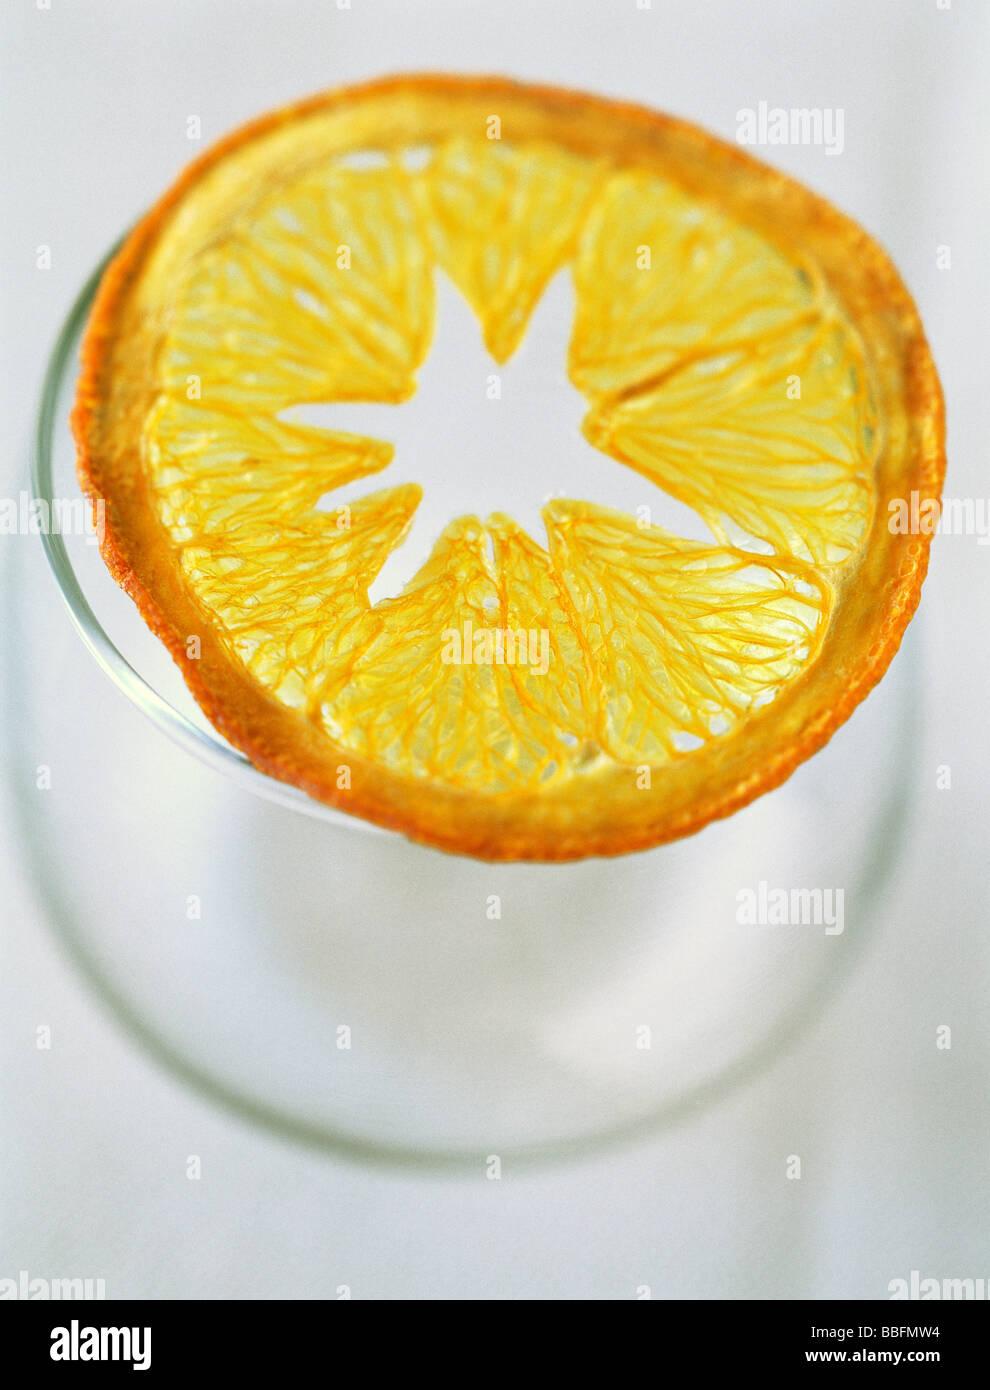 Dried orange slice on top of glass - Stock Image